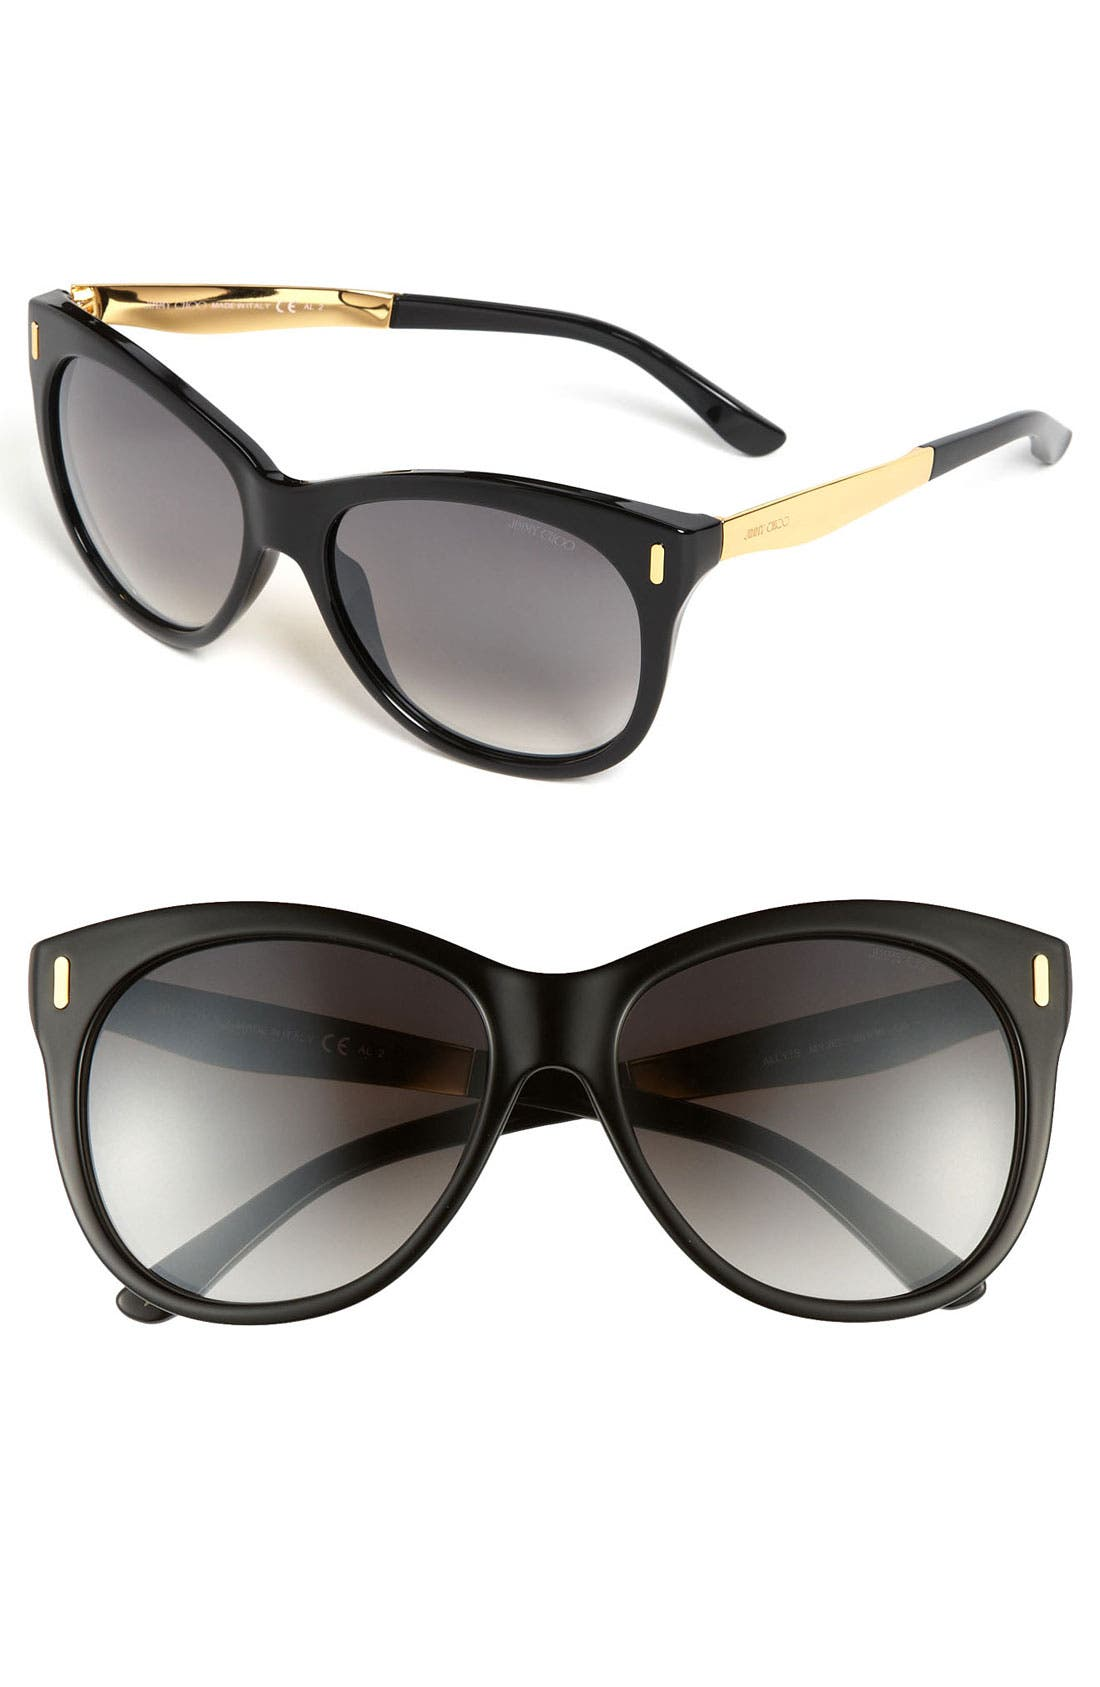 'Ally' 56mm Retro Sunglasses,                             Main thumbnail 1, color,                             Black/ Grey Gradient